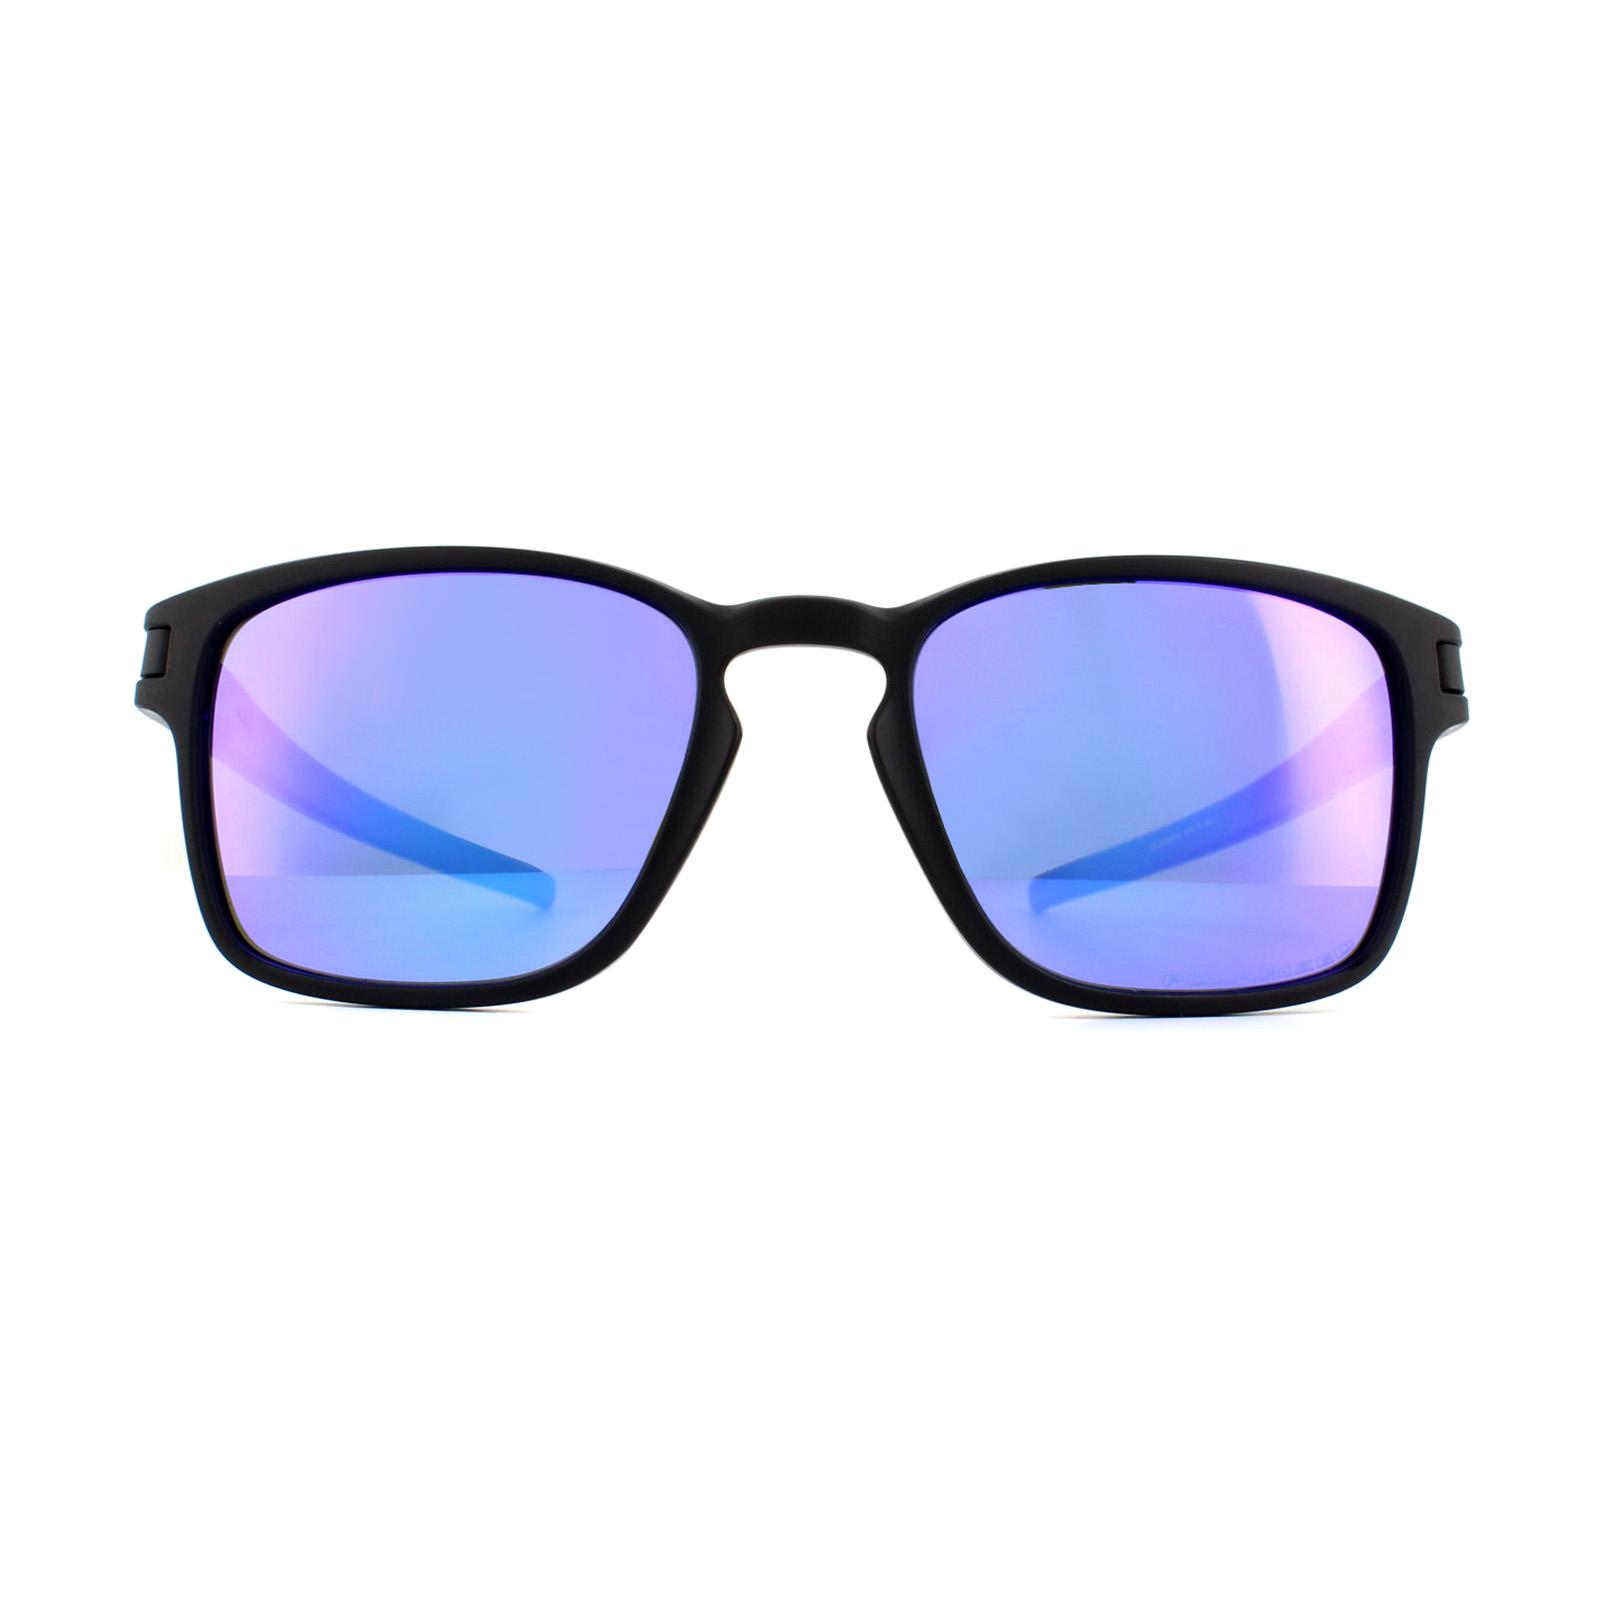 5fd0e5d545 Sentinel Oakley Sunglasses Latch Square OO9353-04 Black Violet Iridium  Polarized